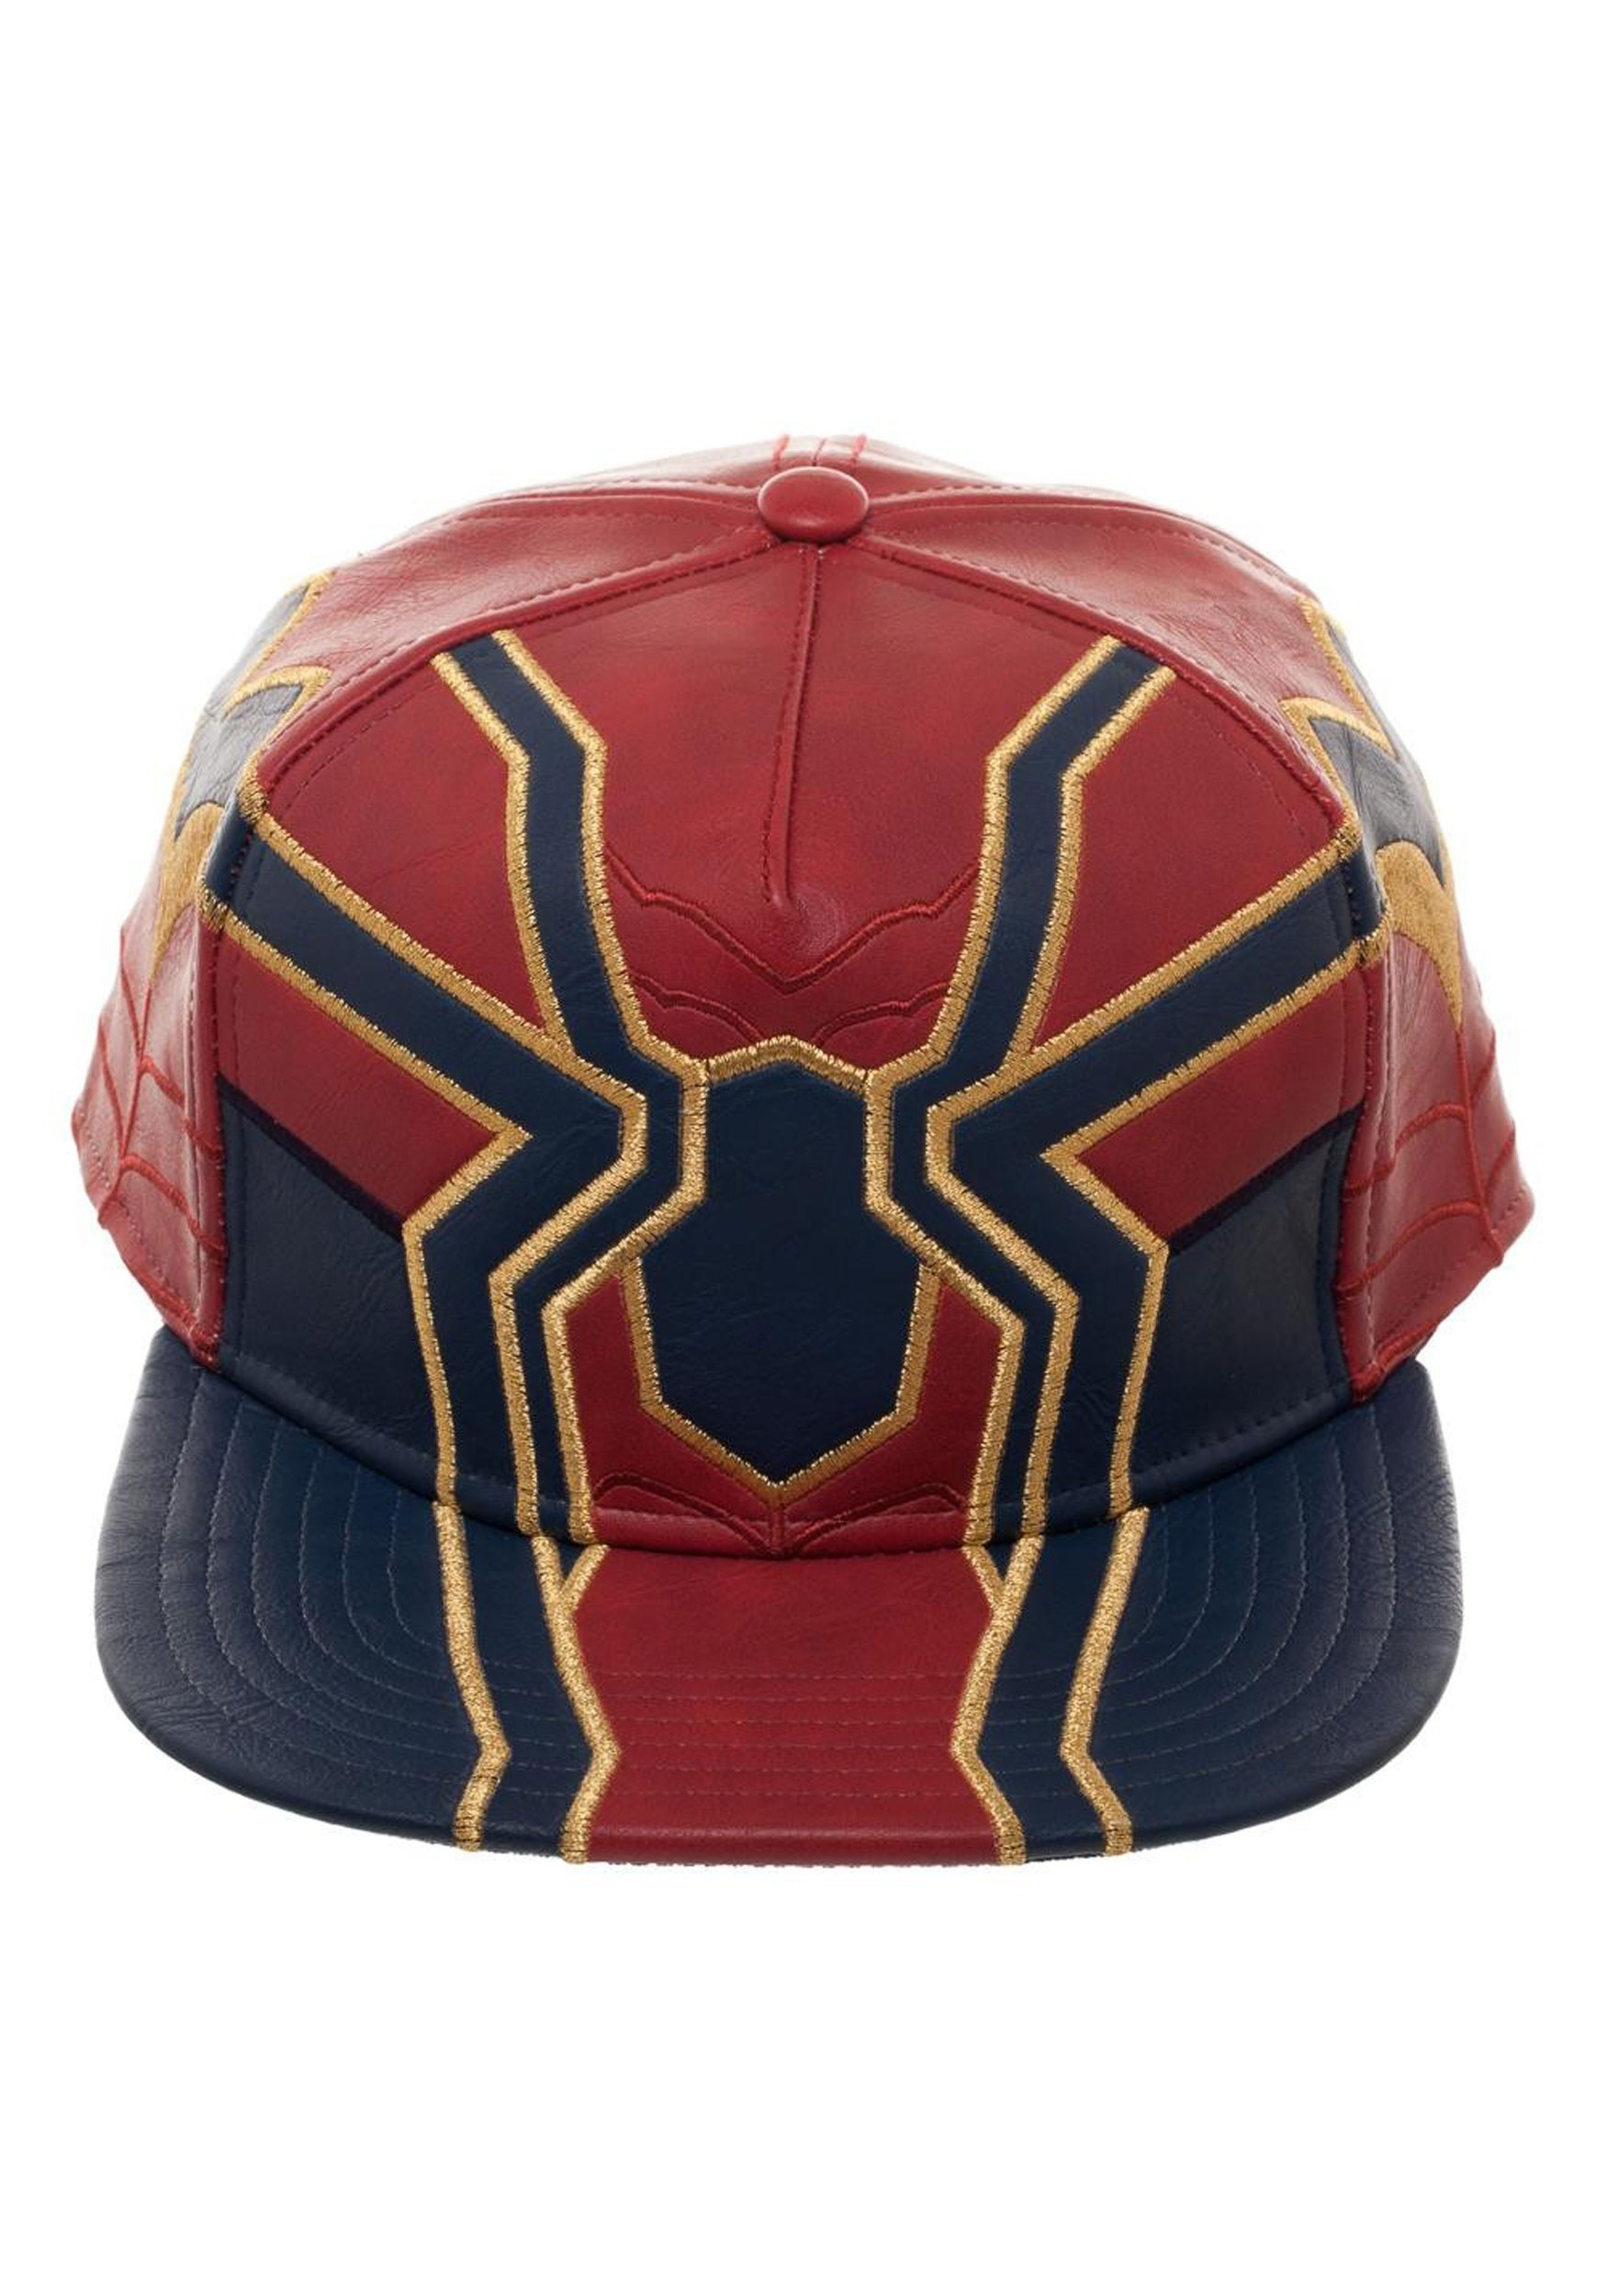 Avengers Infinity War Iron Spider Suit Up PU Snapback Cap 3190c398dba0